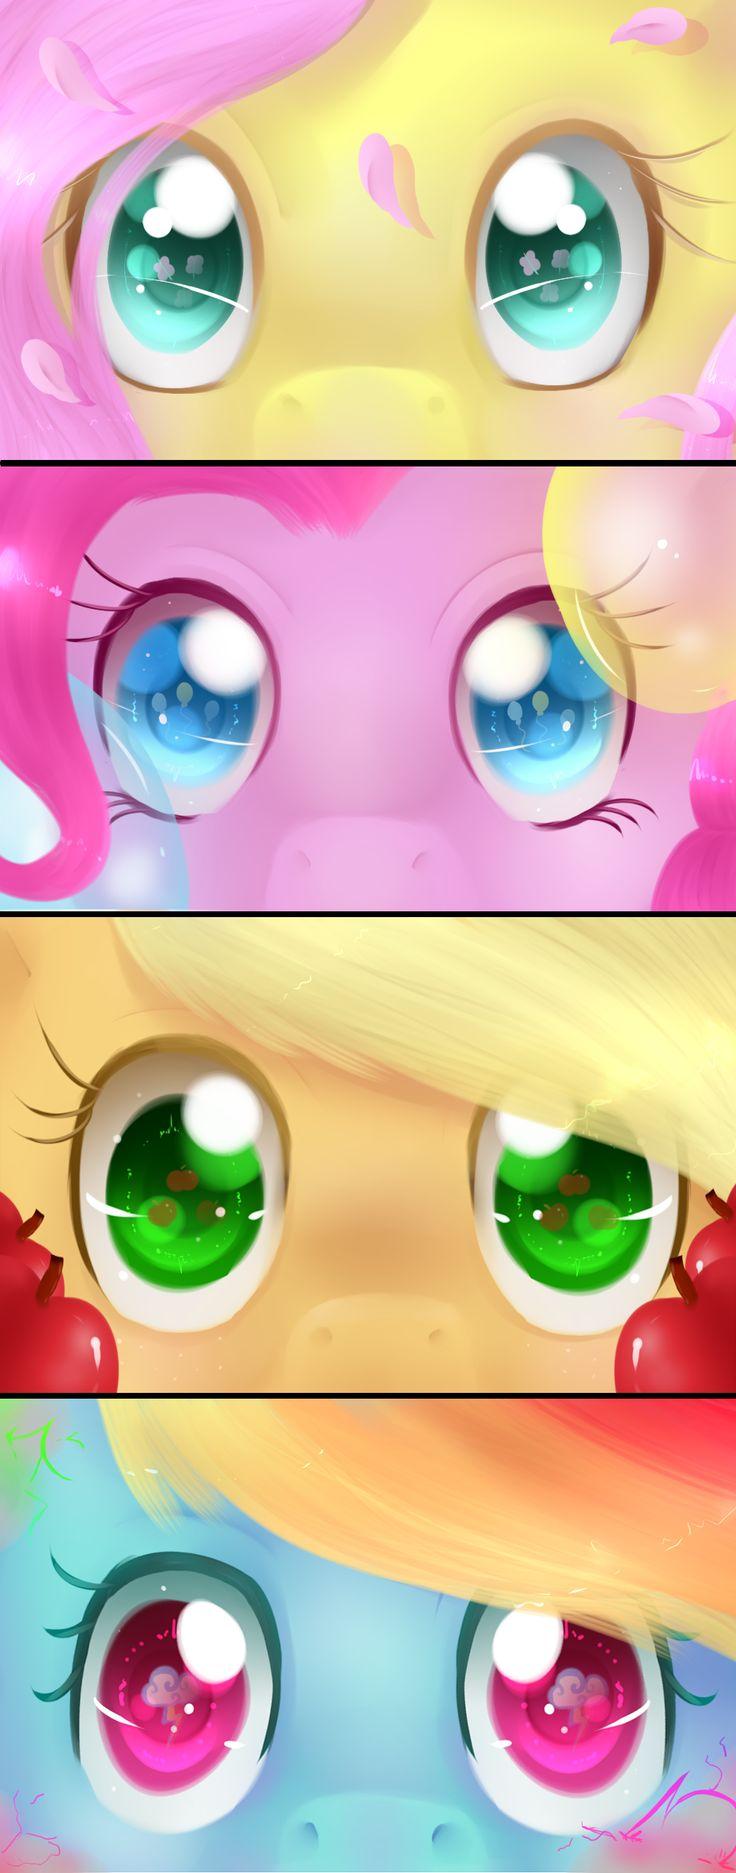 Elements of Harmony Eye set part 1 by Neko-luvz on DeviantArt